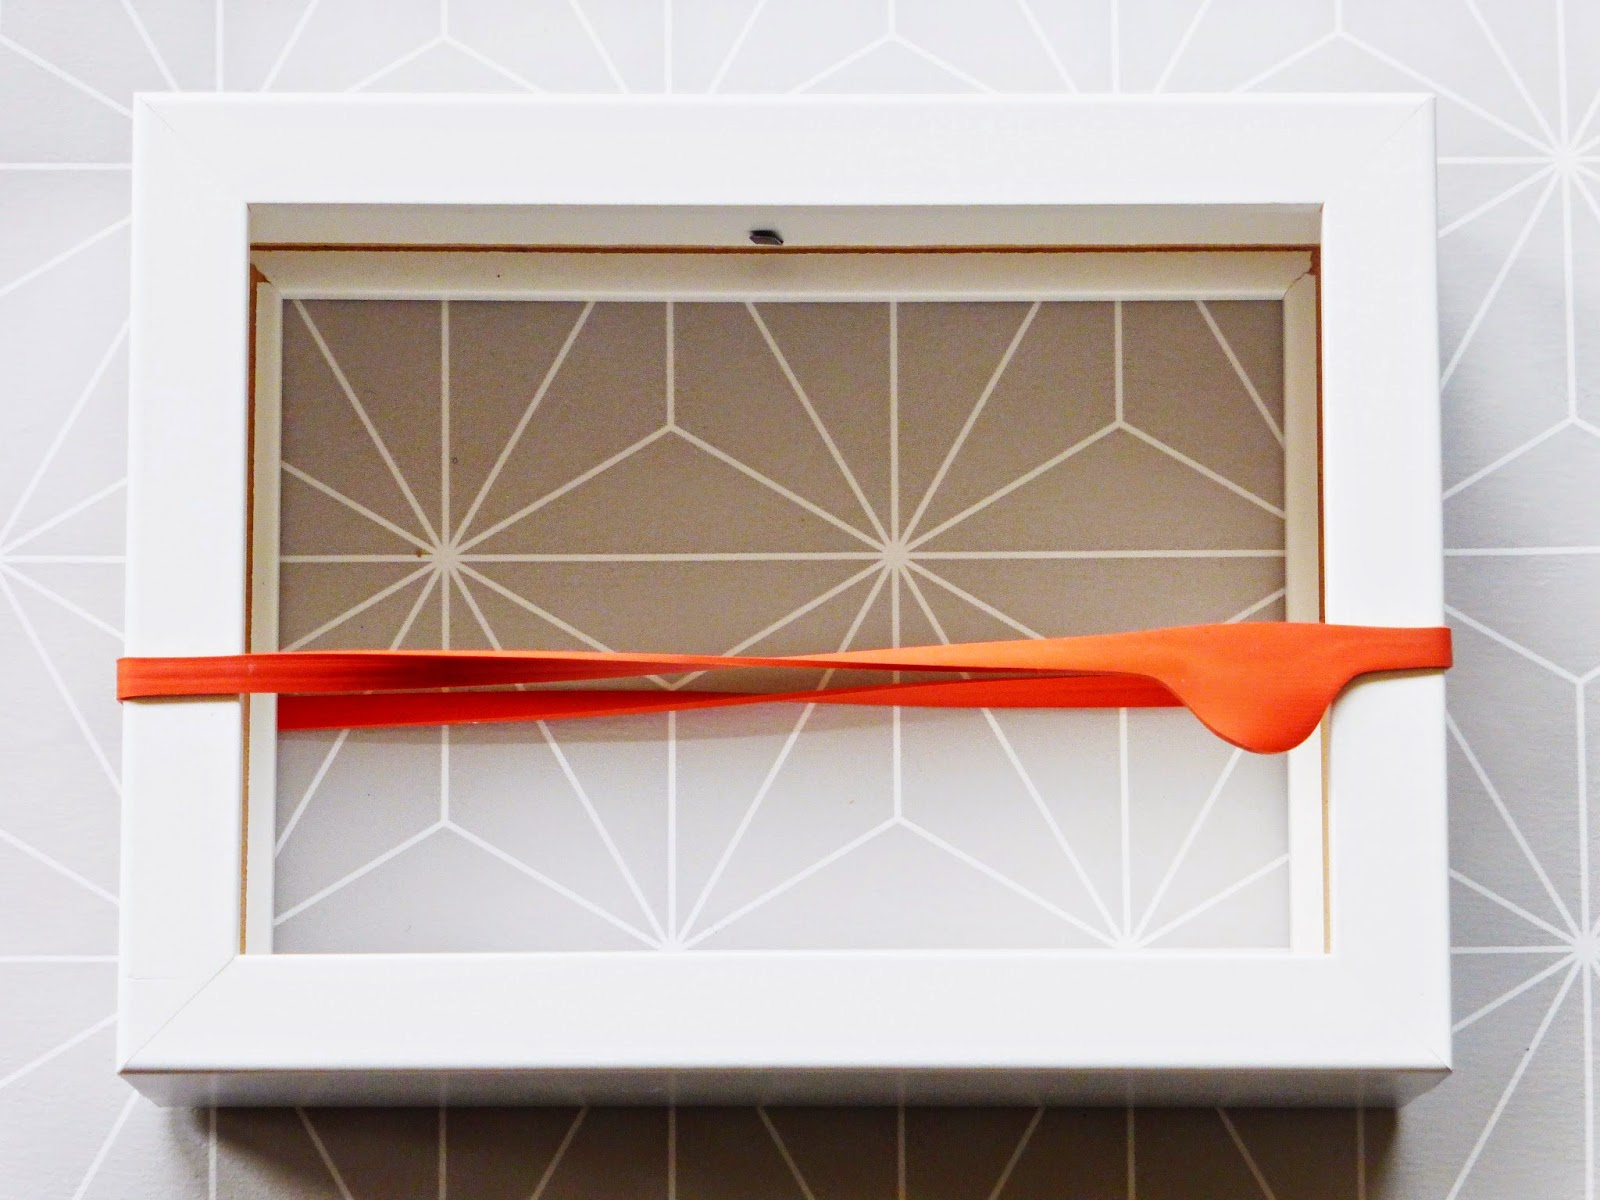 kerstin ich selbermachen ikea hacking 5 wie man. Black Bedroom Furniture Sets. Home Design Ideas